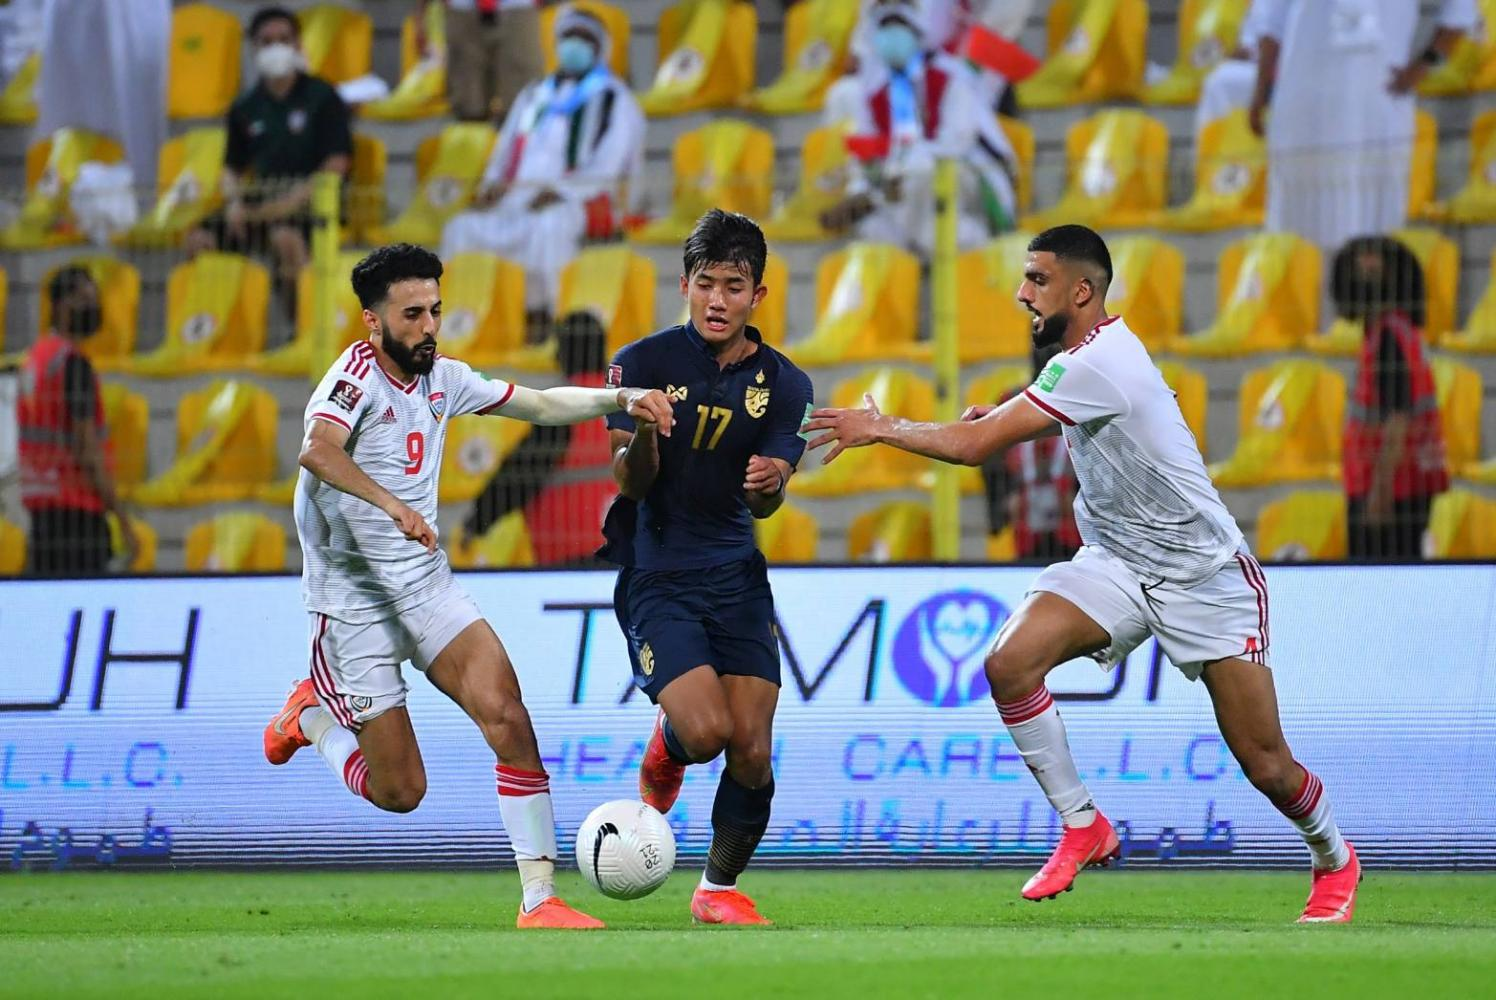 Thailand's Suphanat Mueanta, centre, in action against the UAE in Dubai.